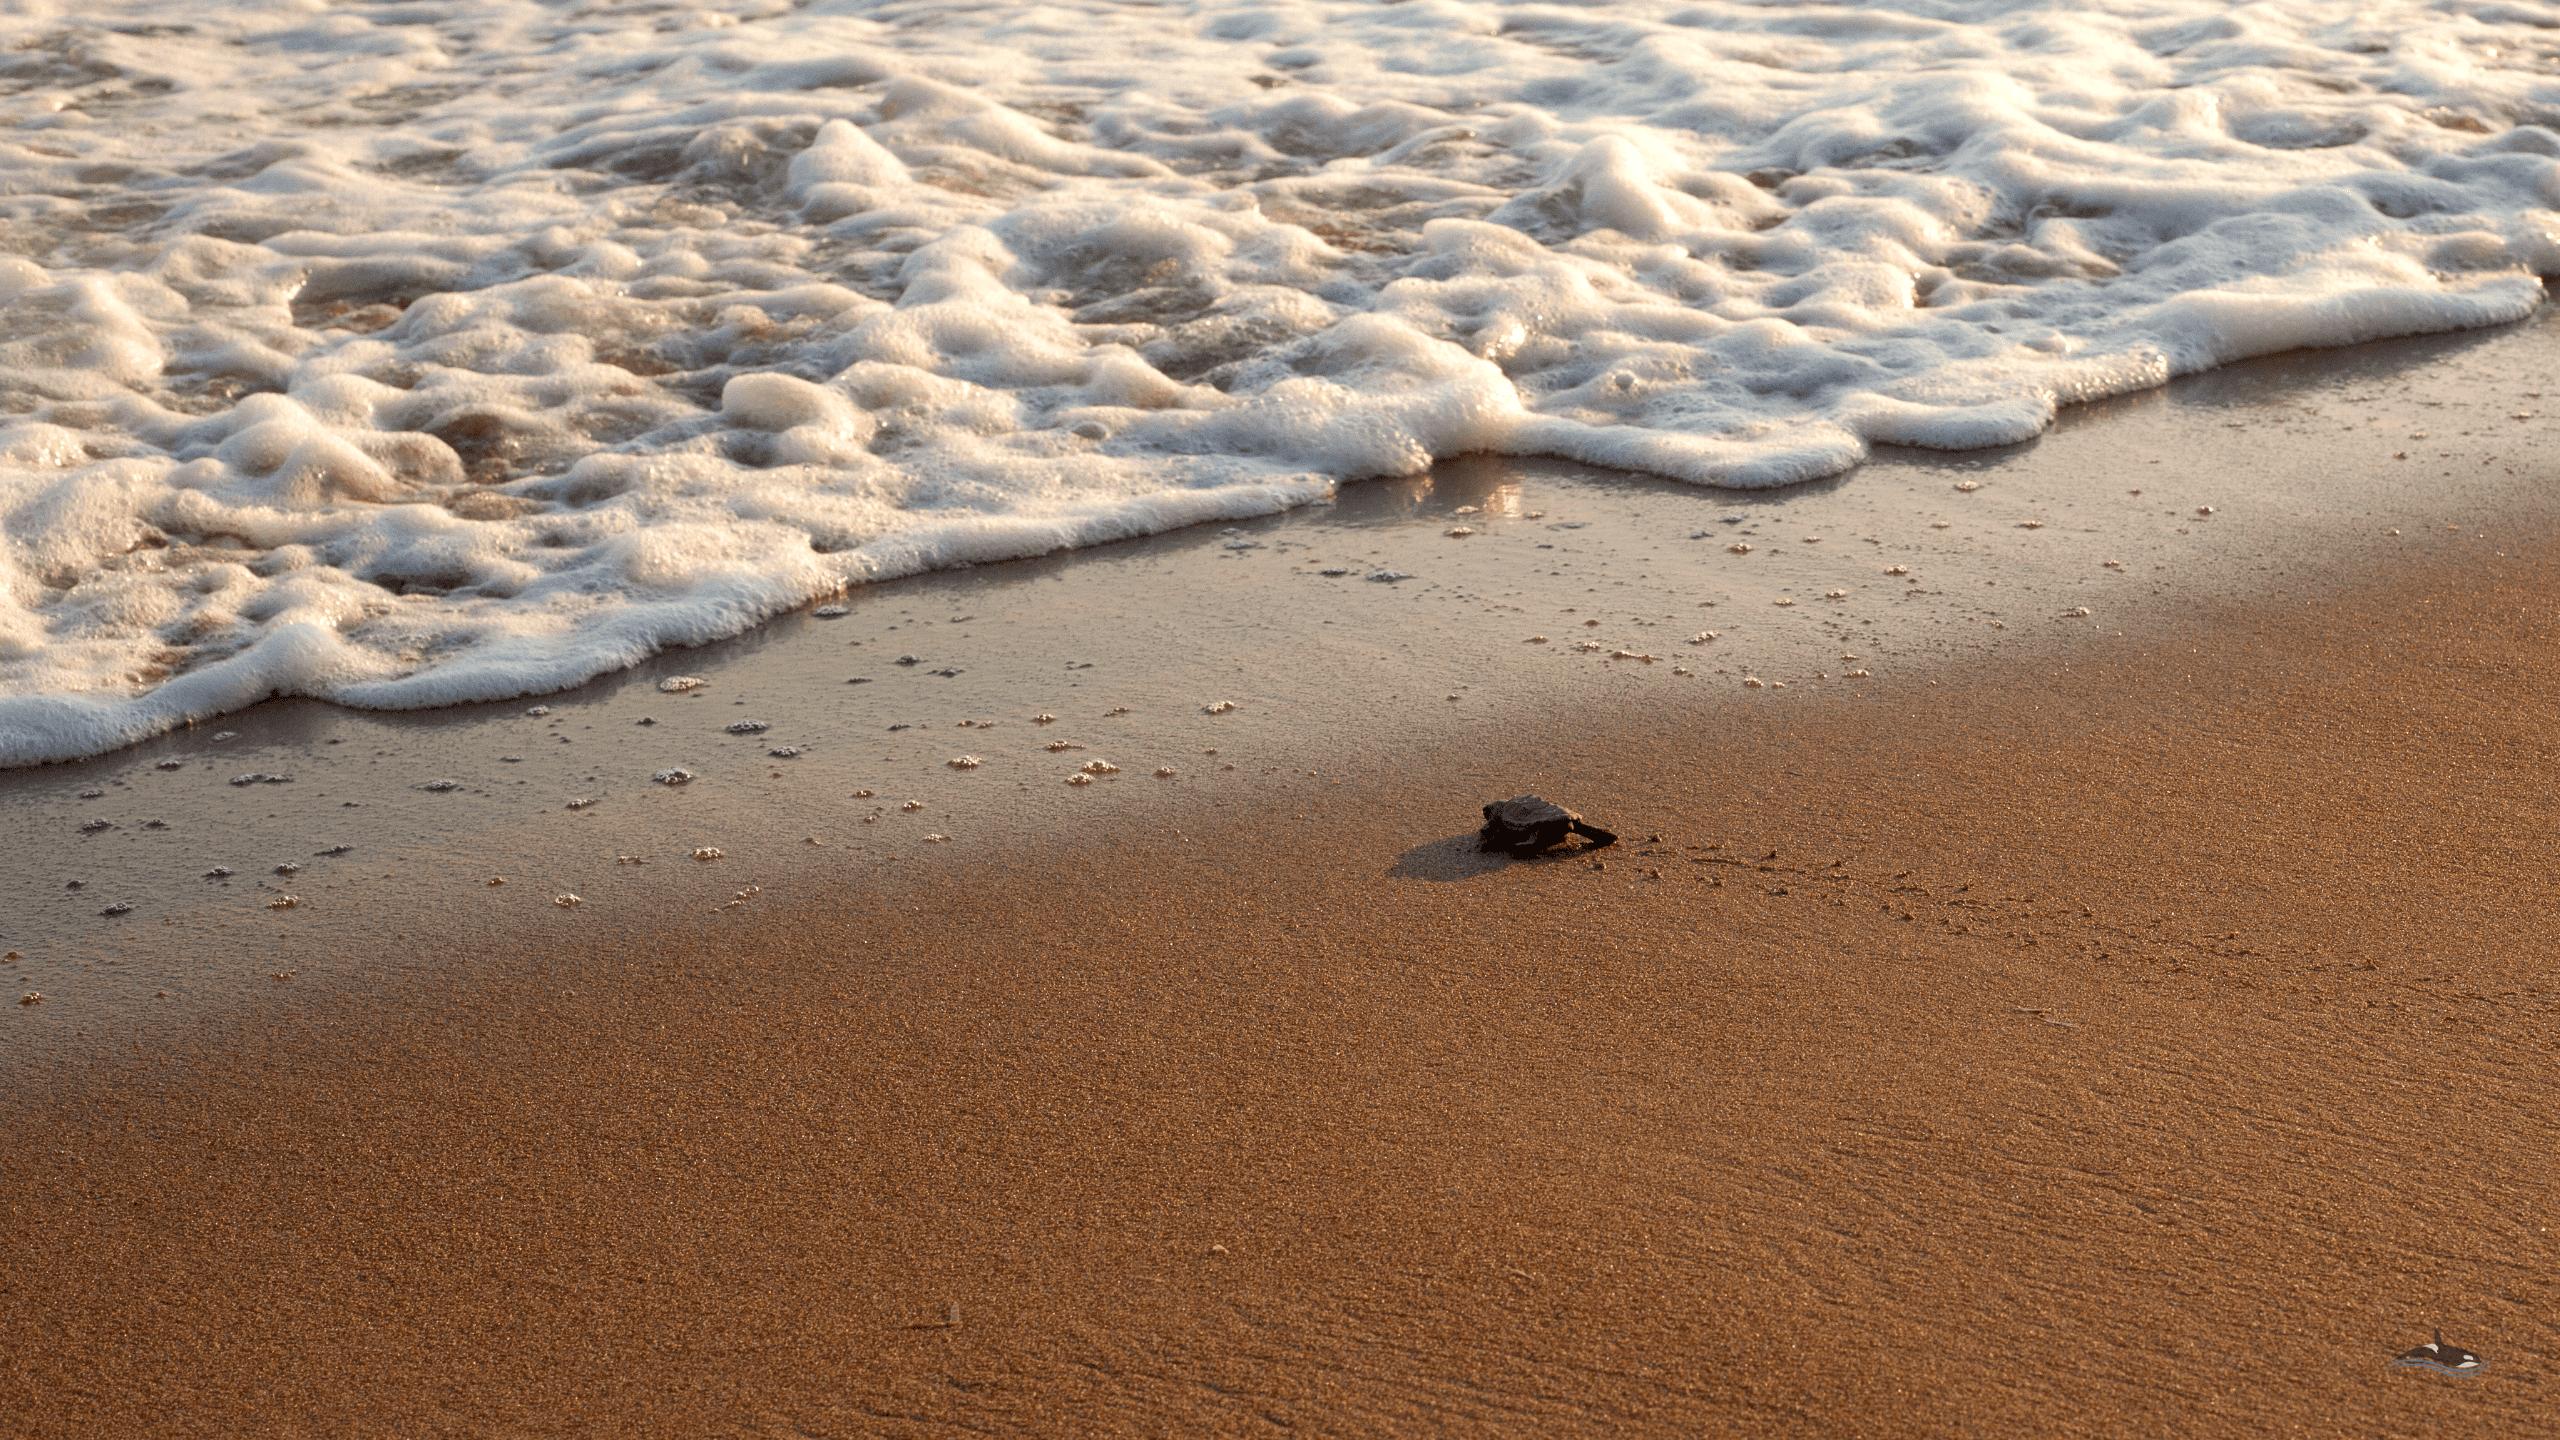 MB sea turtles wallpapers